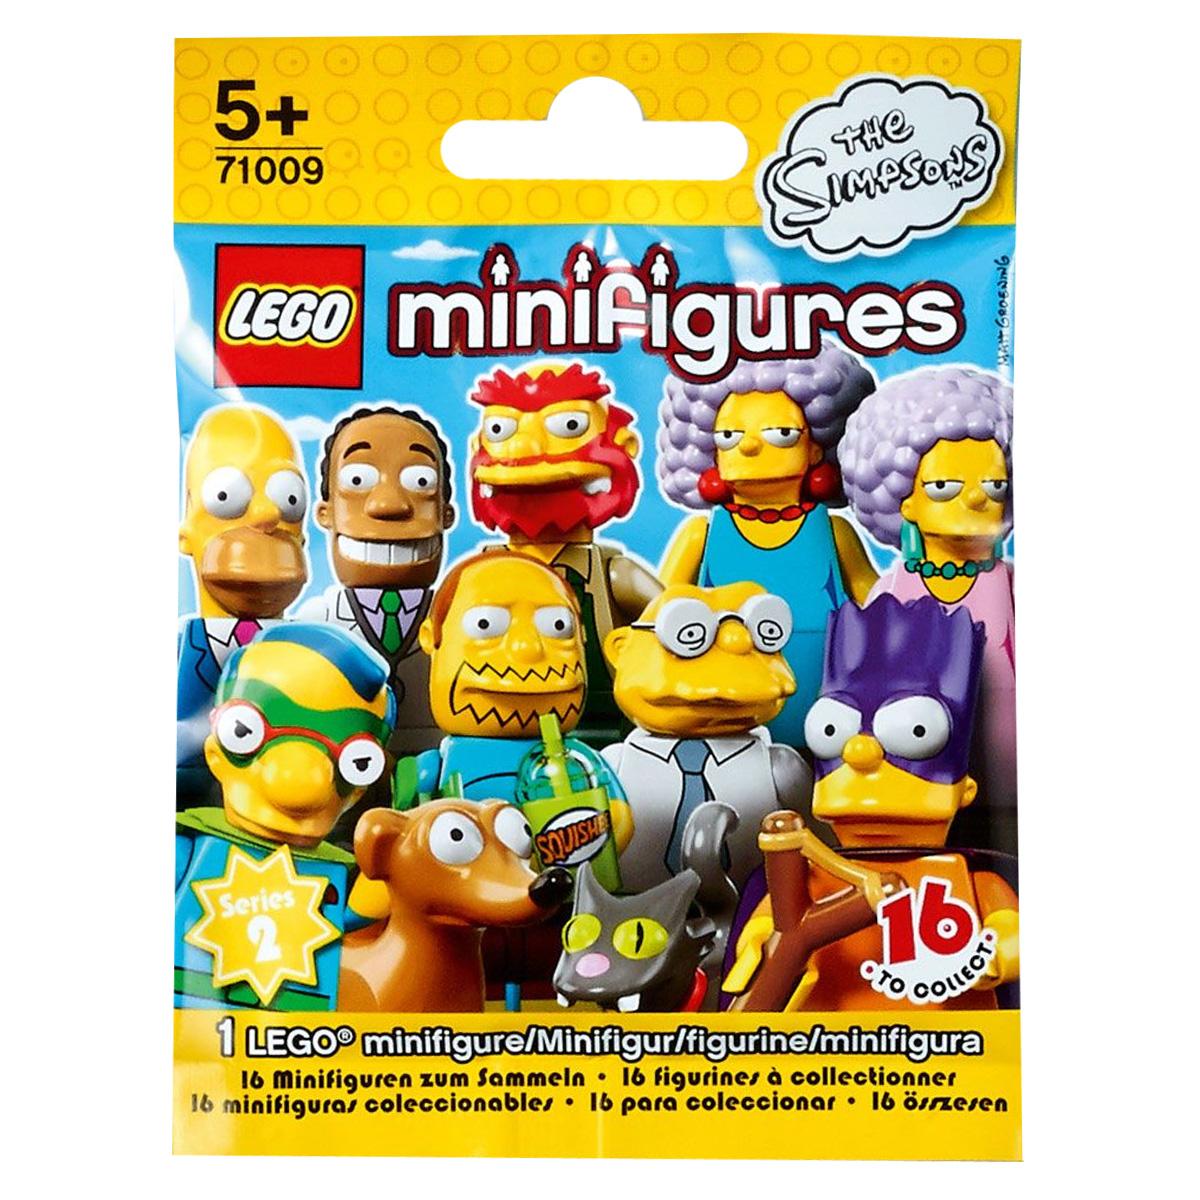 LEGO Minifigures Конструктор Simpsons 71009